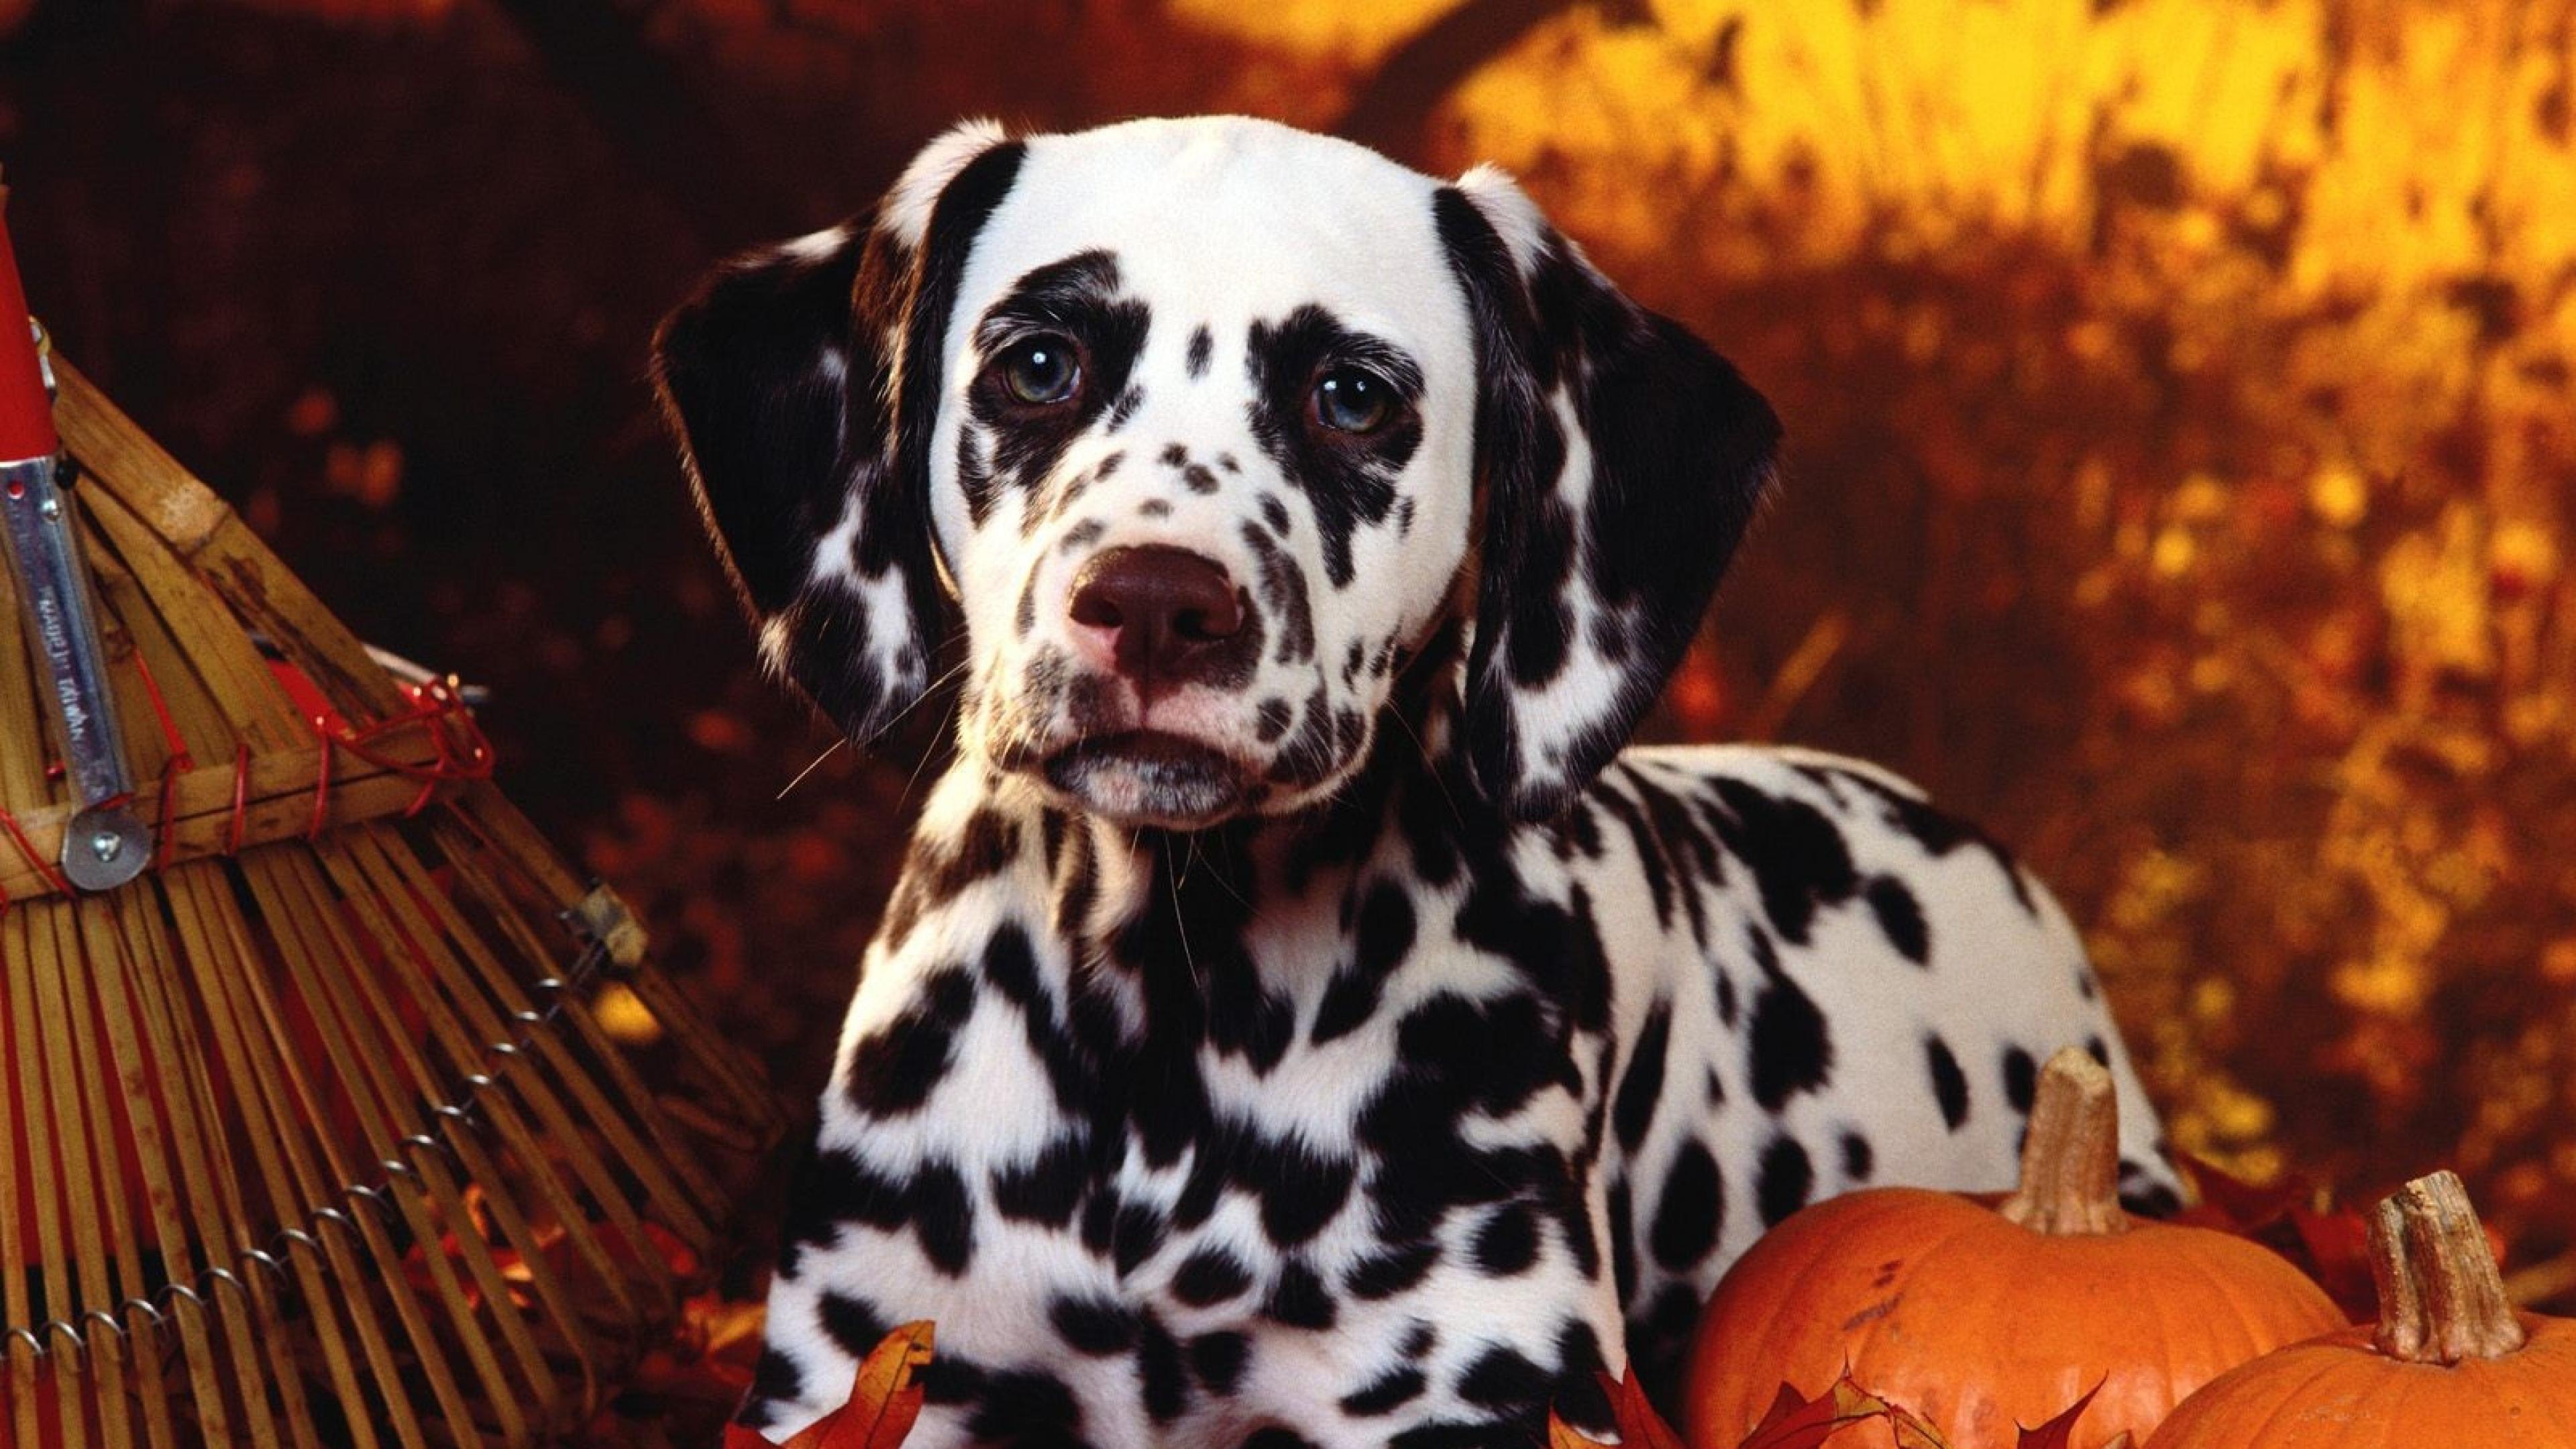 Download Wallpaper Halloween Puppy - dalmatian_dog_sit_breed_pumpkins_leaves_halloween_51671_3840x2160  Snapshot_217844.jpg